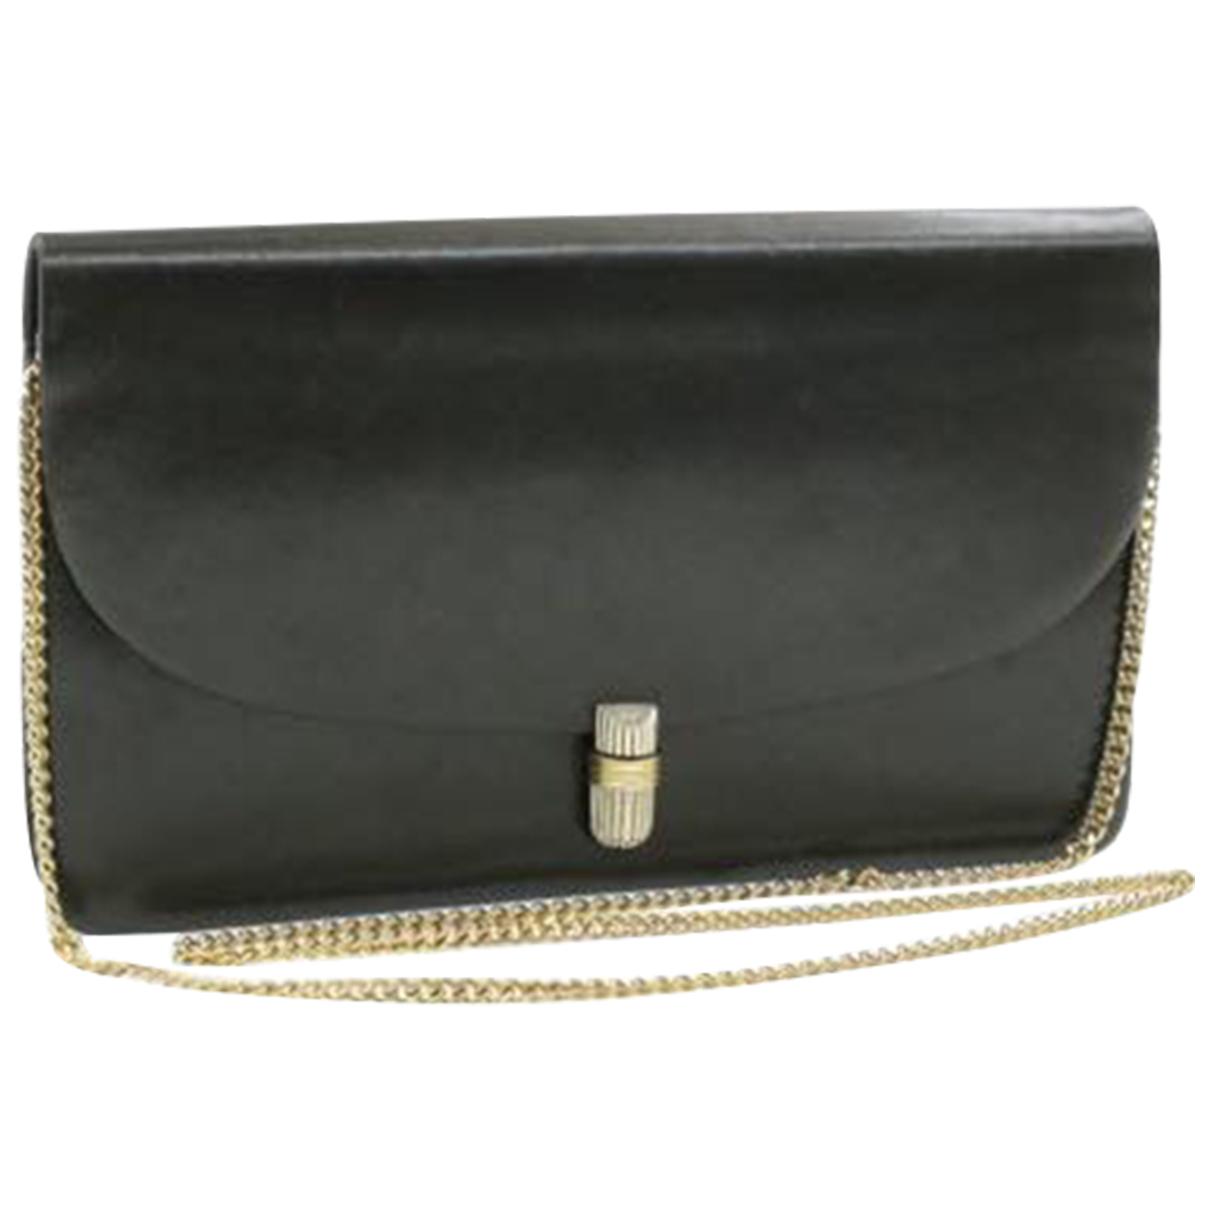 Christian Dior N Black Leather handbag for Women N